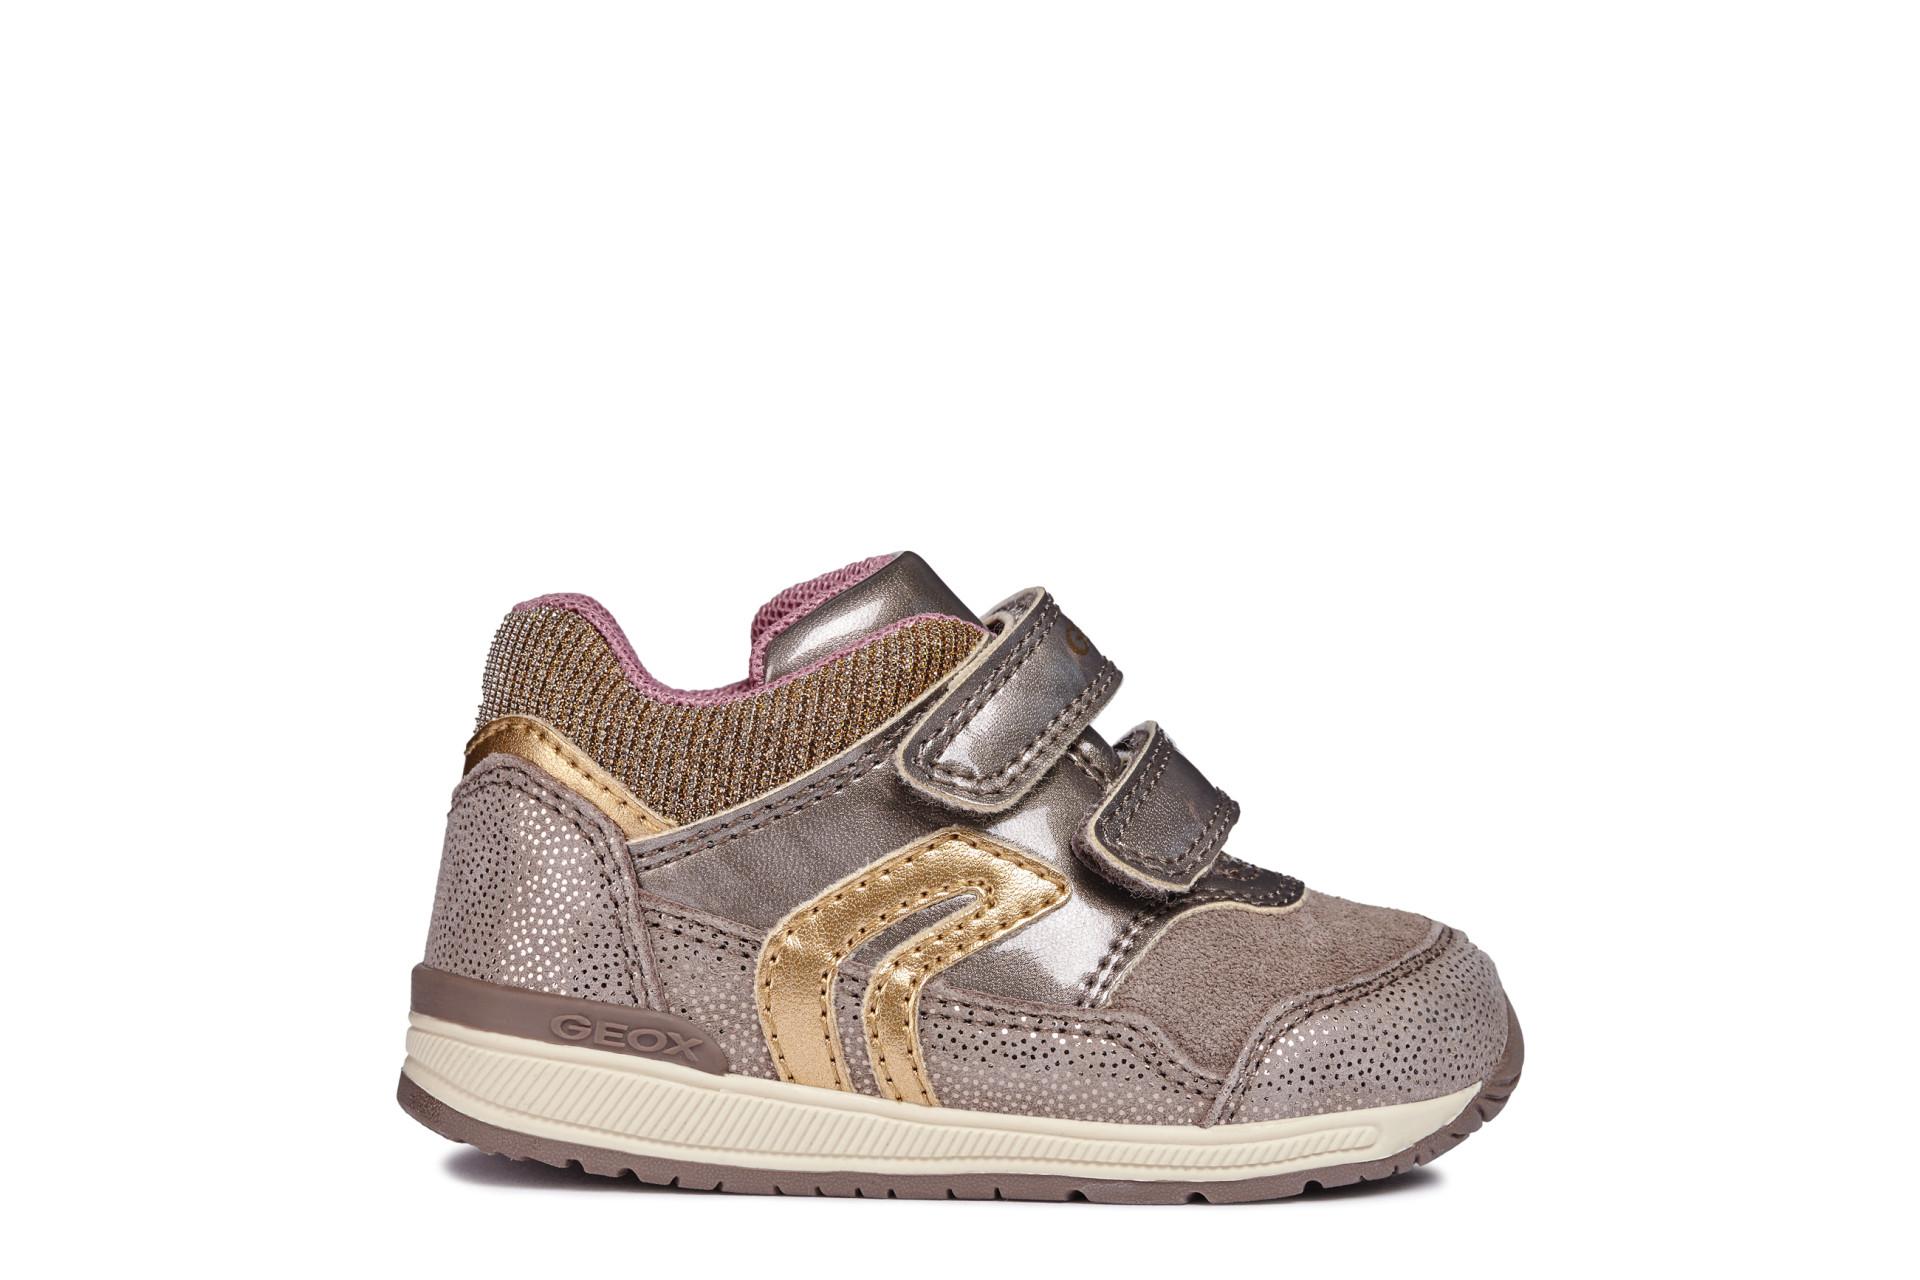 Molo kids fashion :: Geox arany csillogós félcipő Geox Zárt